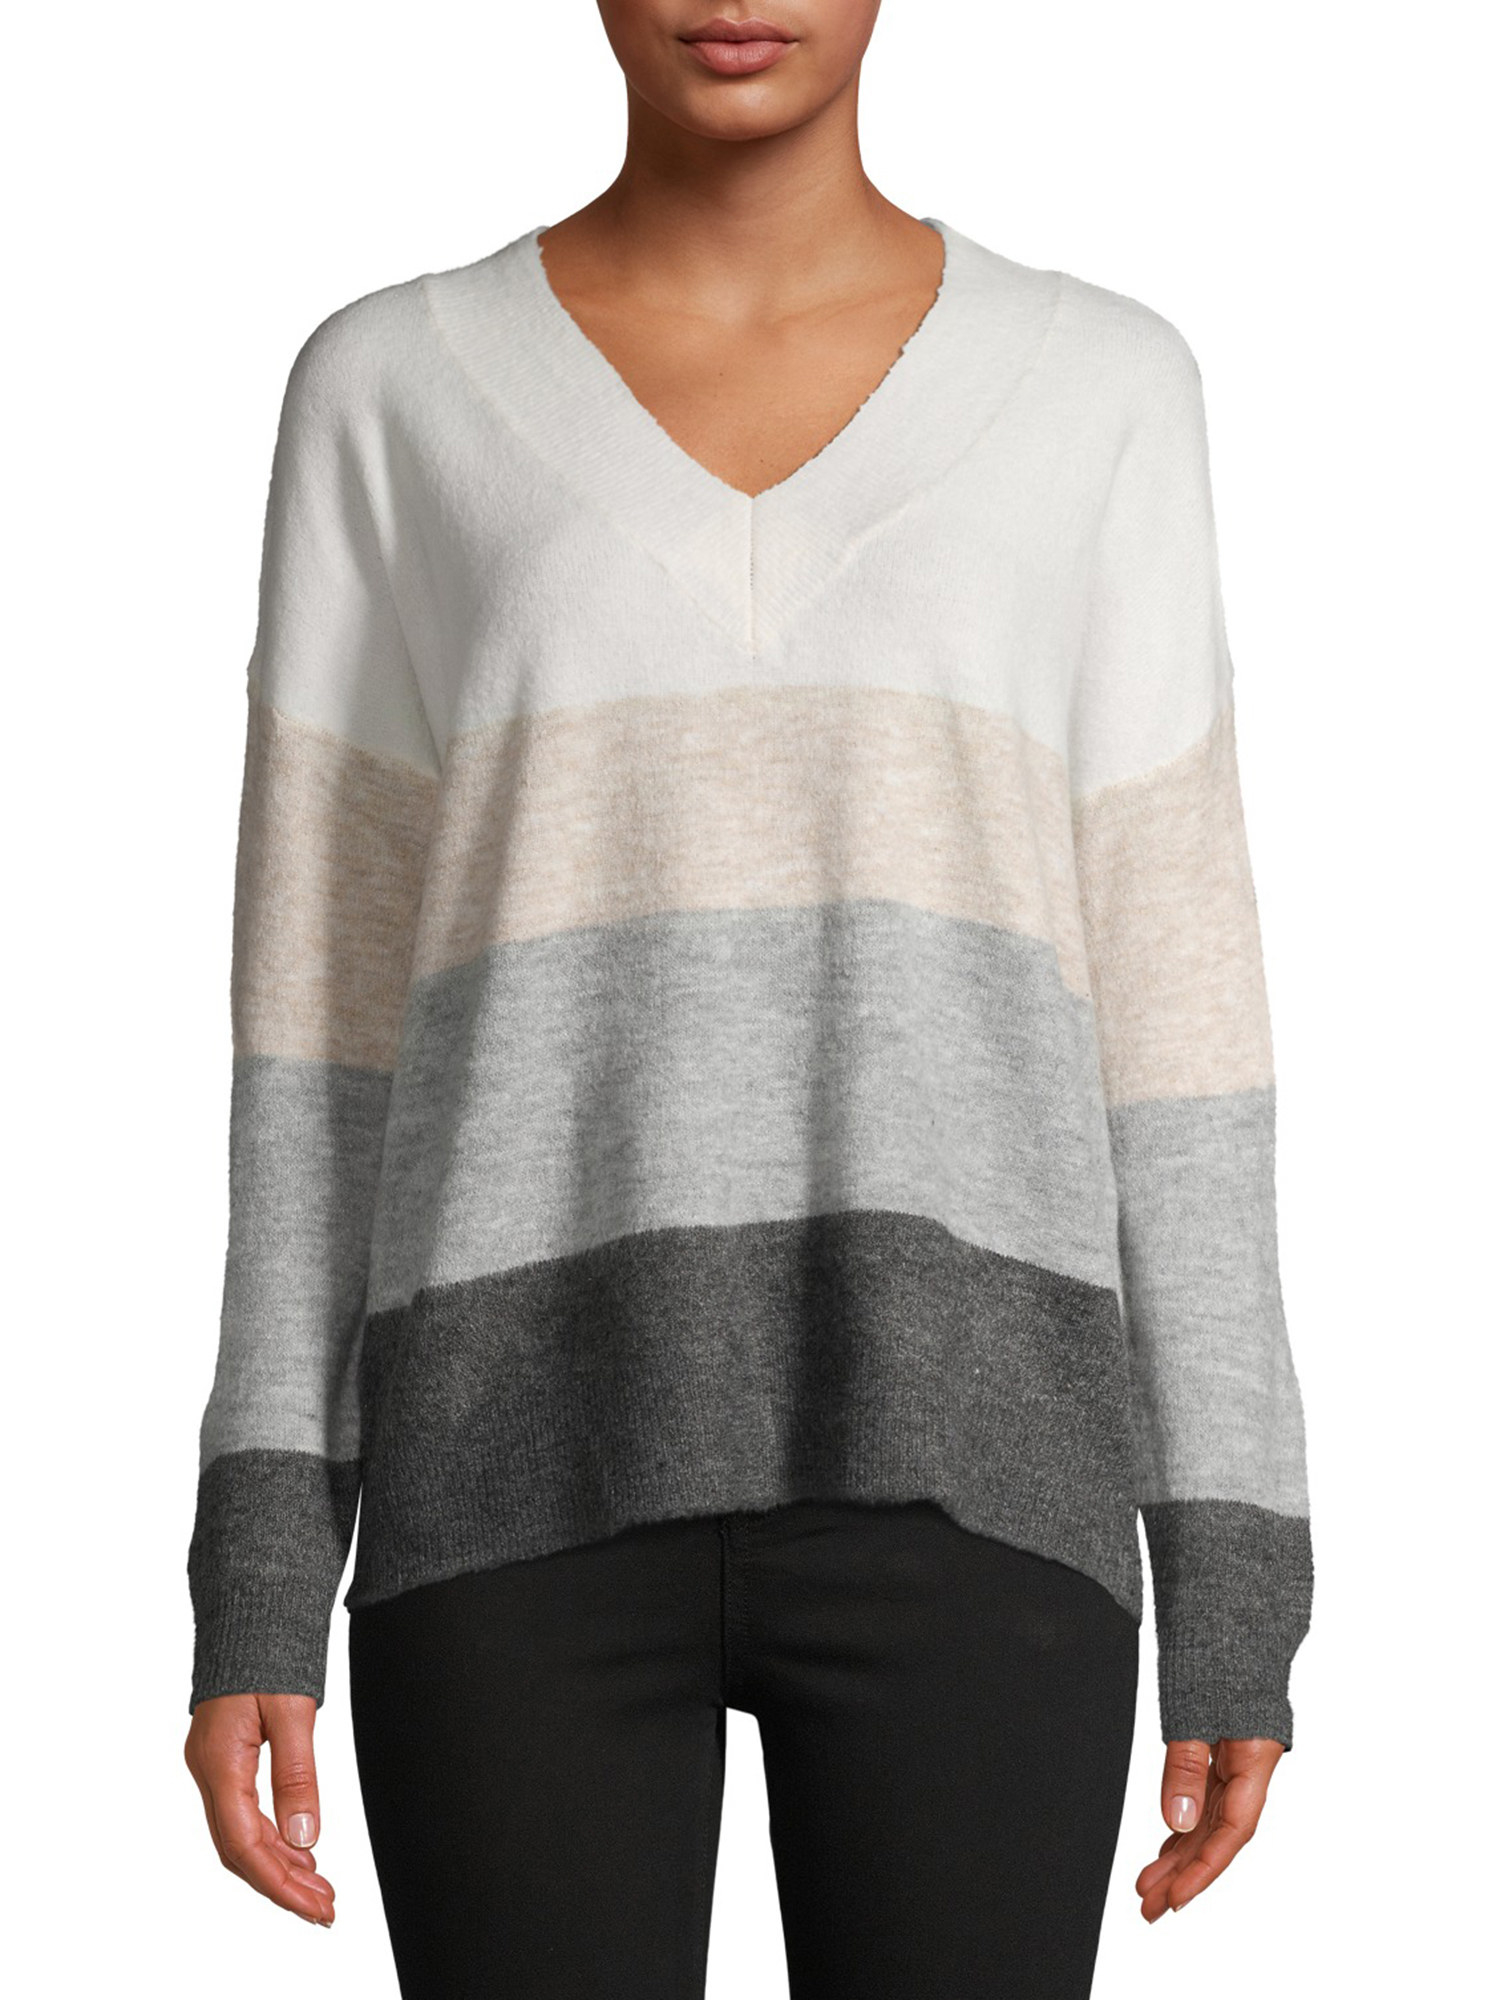 The v-neck sweater